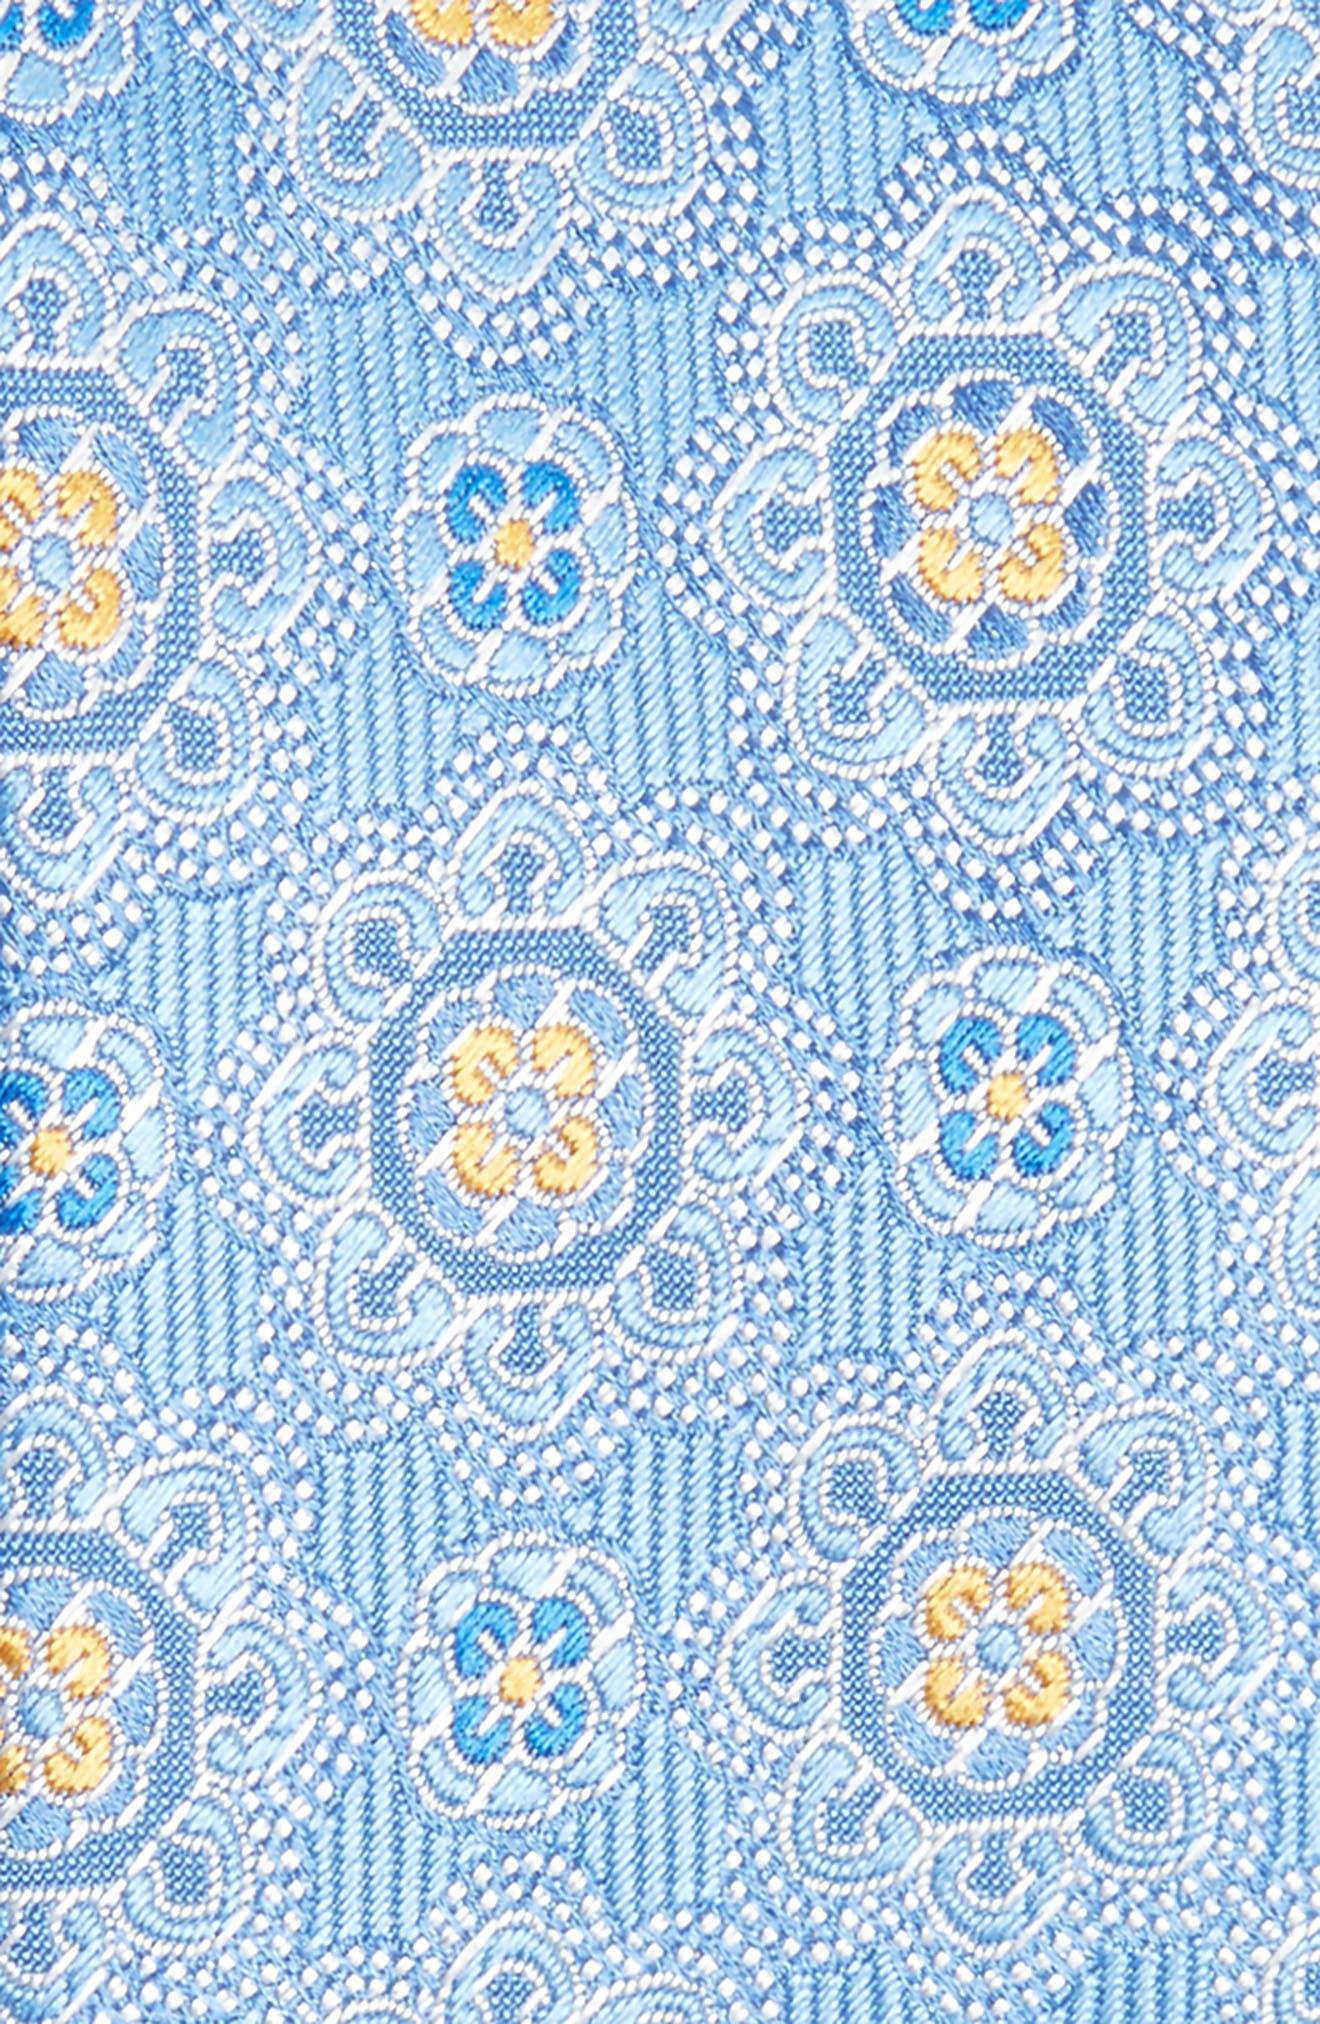 Medallion Silk Tie,                             Alternate thumbnail 2, color,                             330